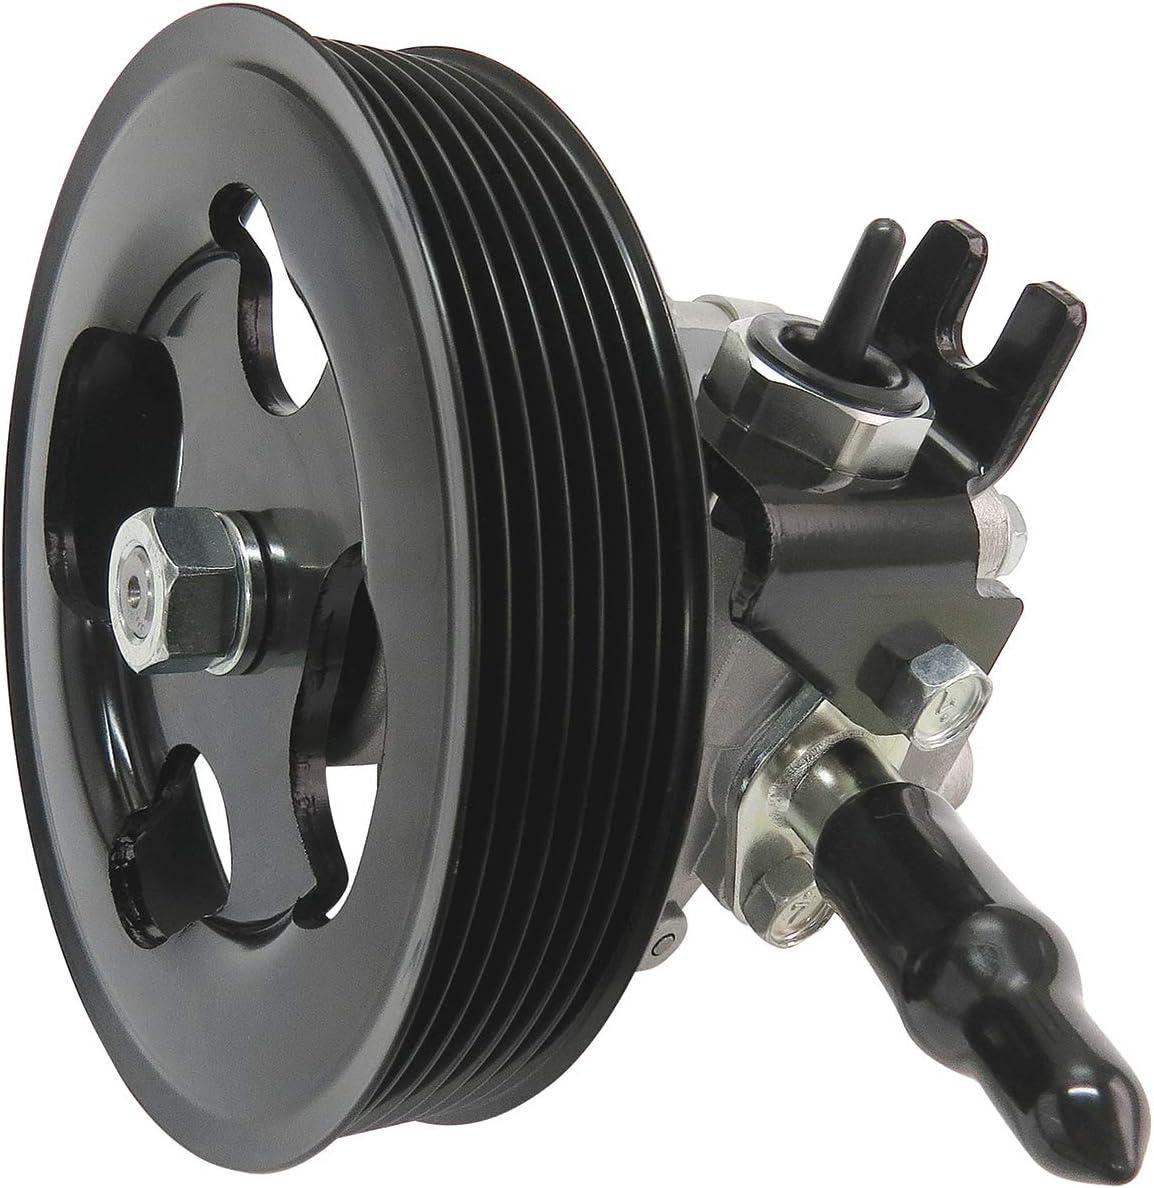 Hitachi PSP0006 List price Power Steering Pump New product